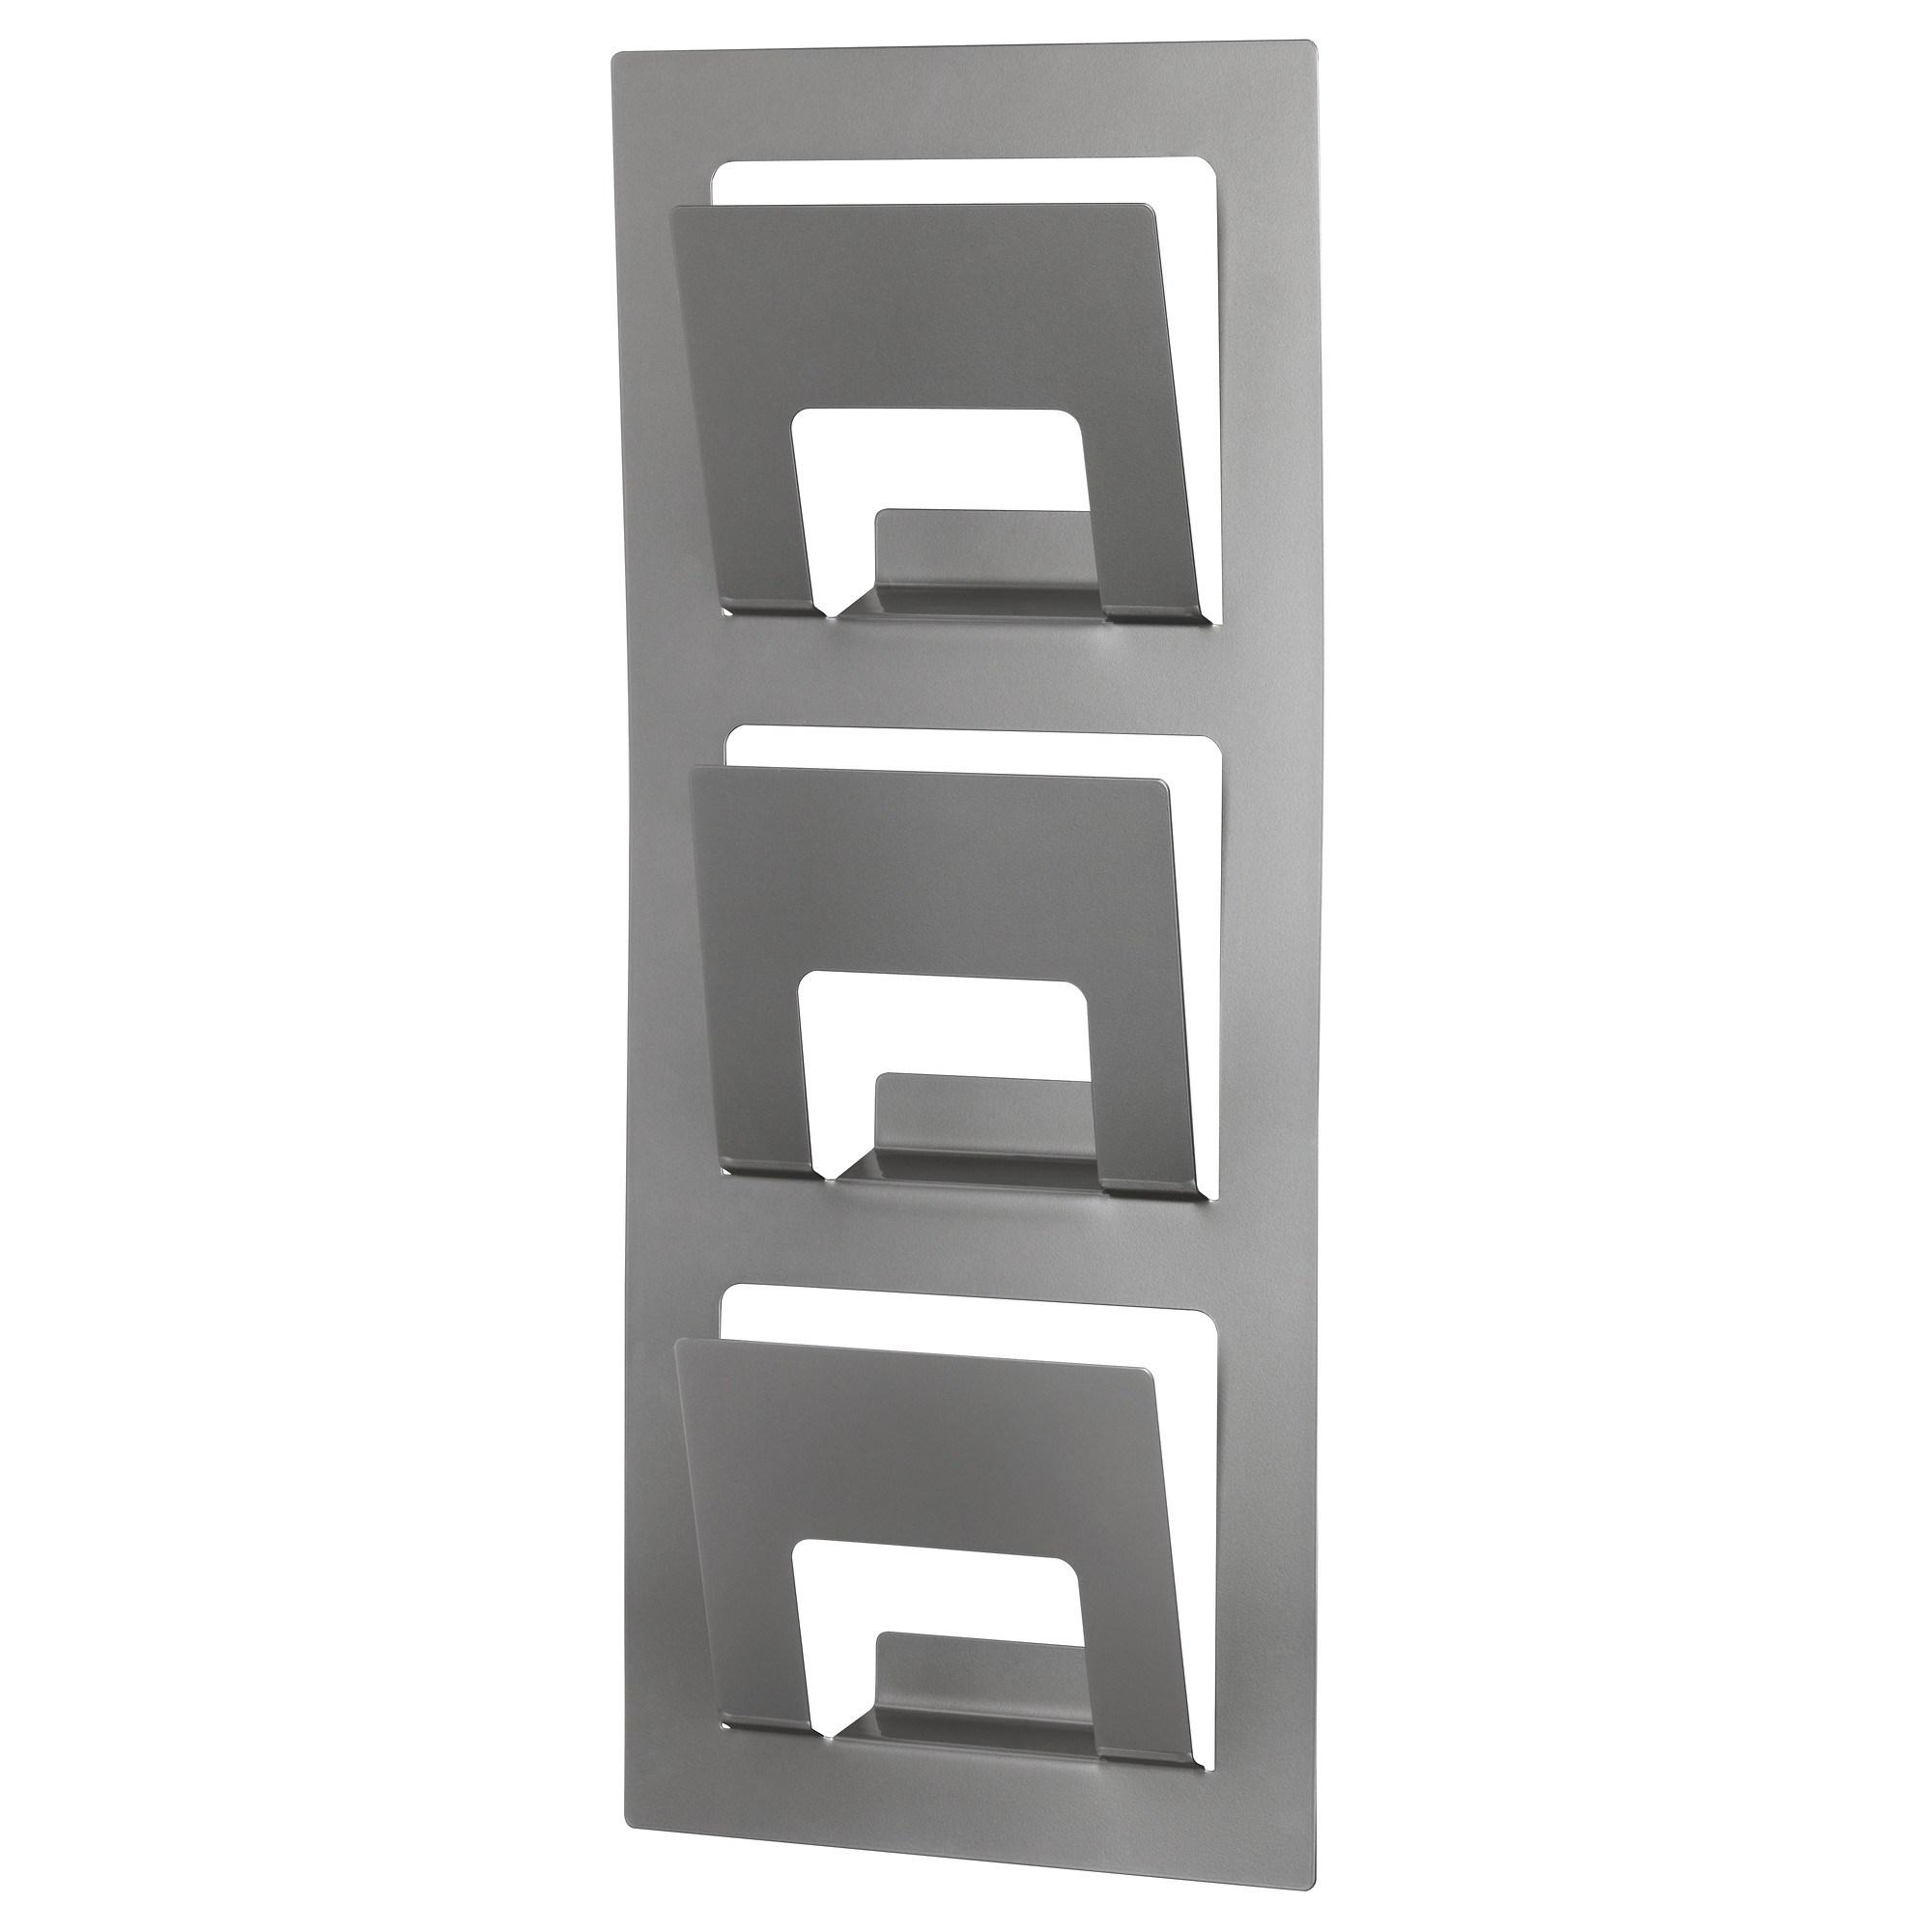 porte document mural metal top gallery of interesting. Black Bedroom Furniture Sets. Home Design Ideas